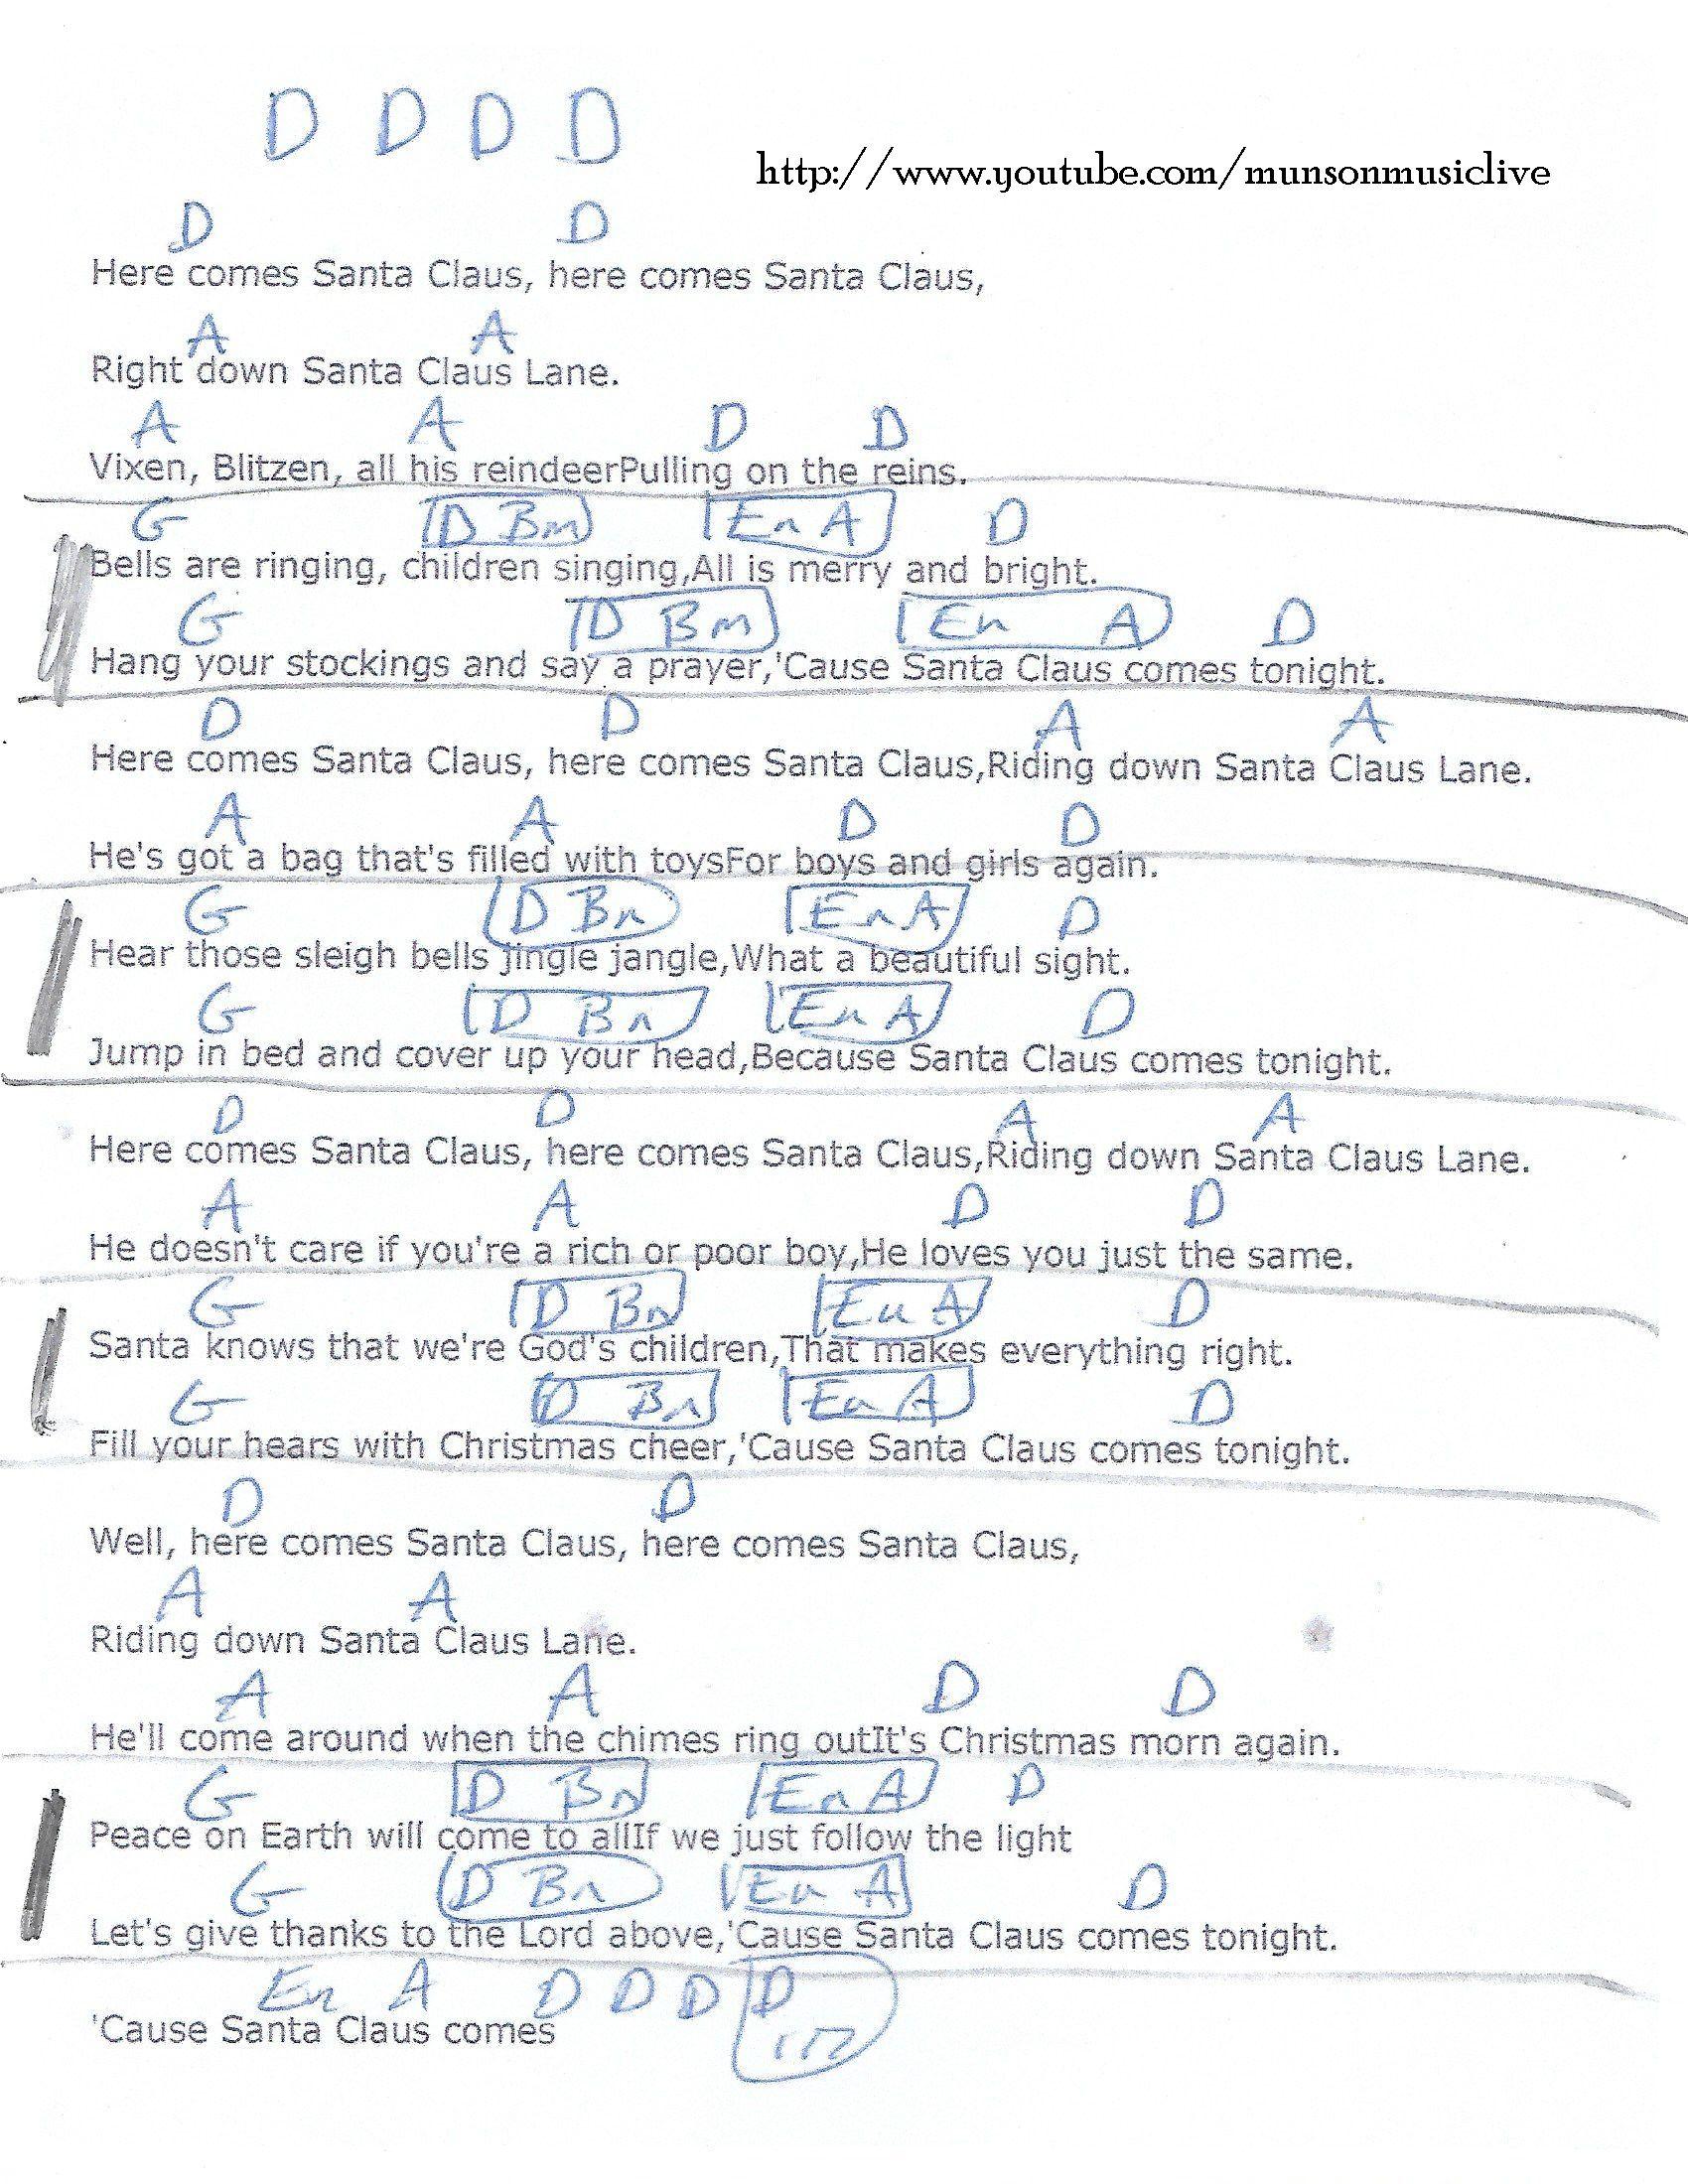 Here Comes Santa Claus - Guitar Chord Chart in D | Piano chords chart, Xmas music, Music guitar